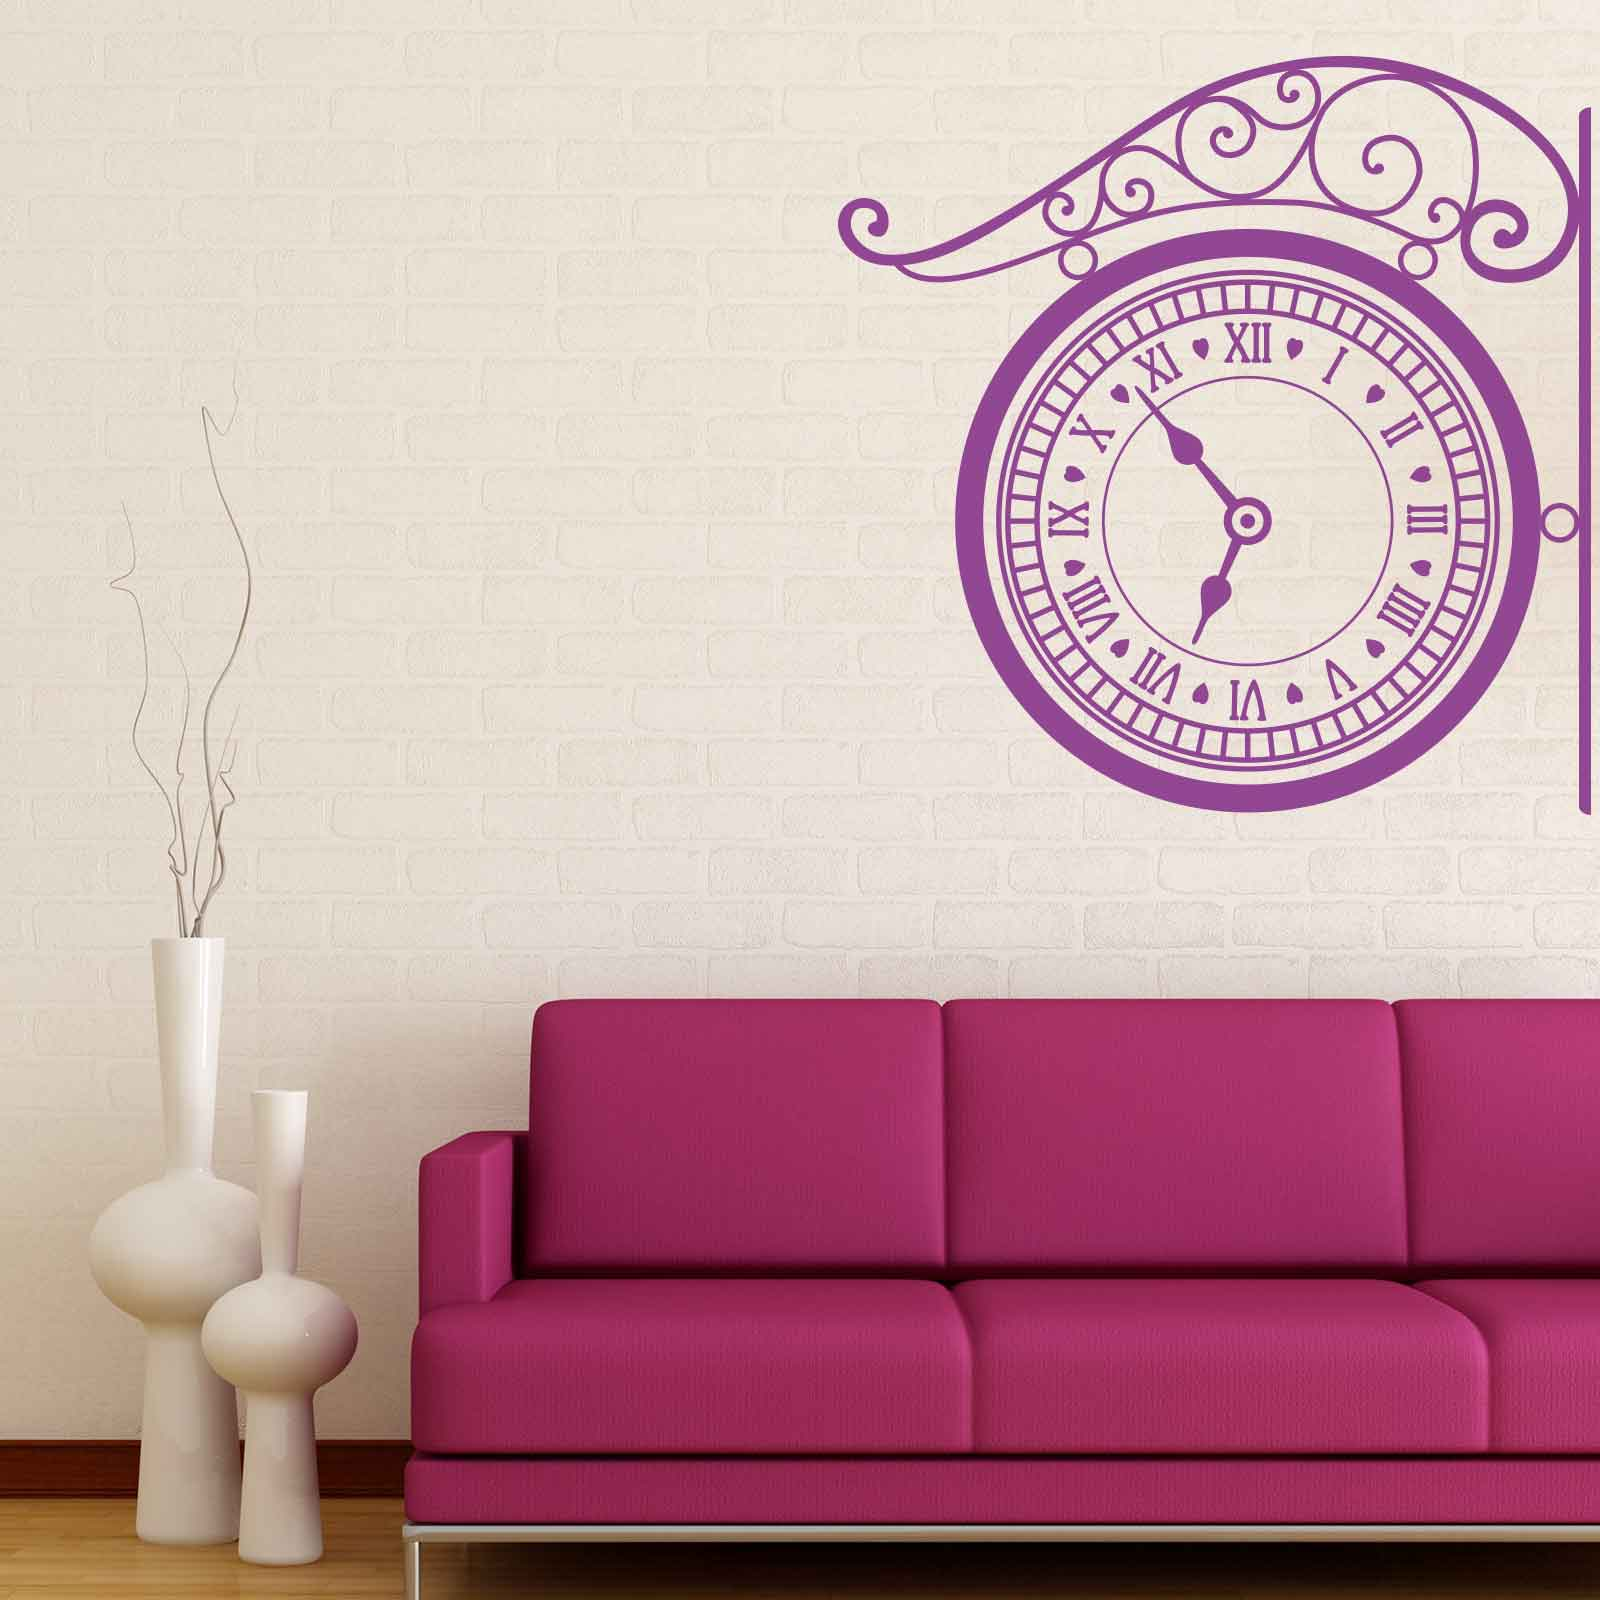 Hanging Lamp Wall Sticker: Hanging Clock Vintage Wall Sticker